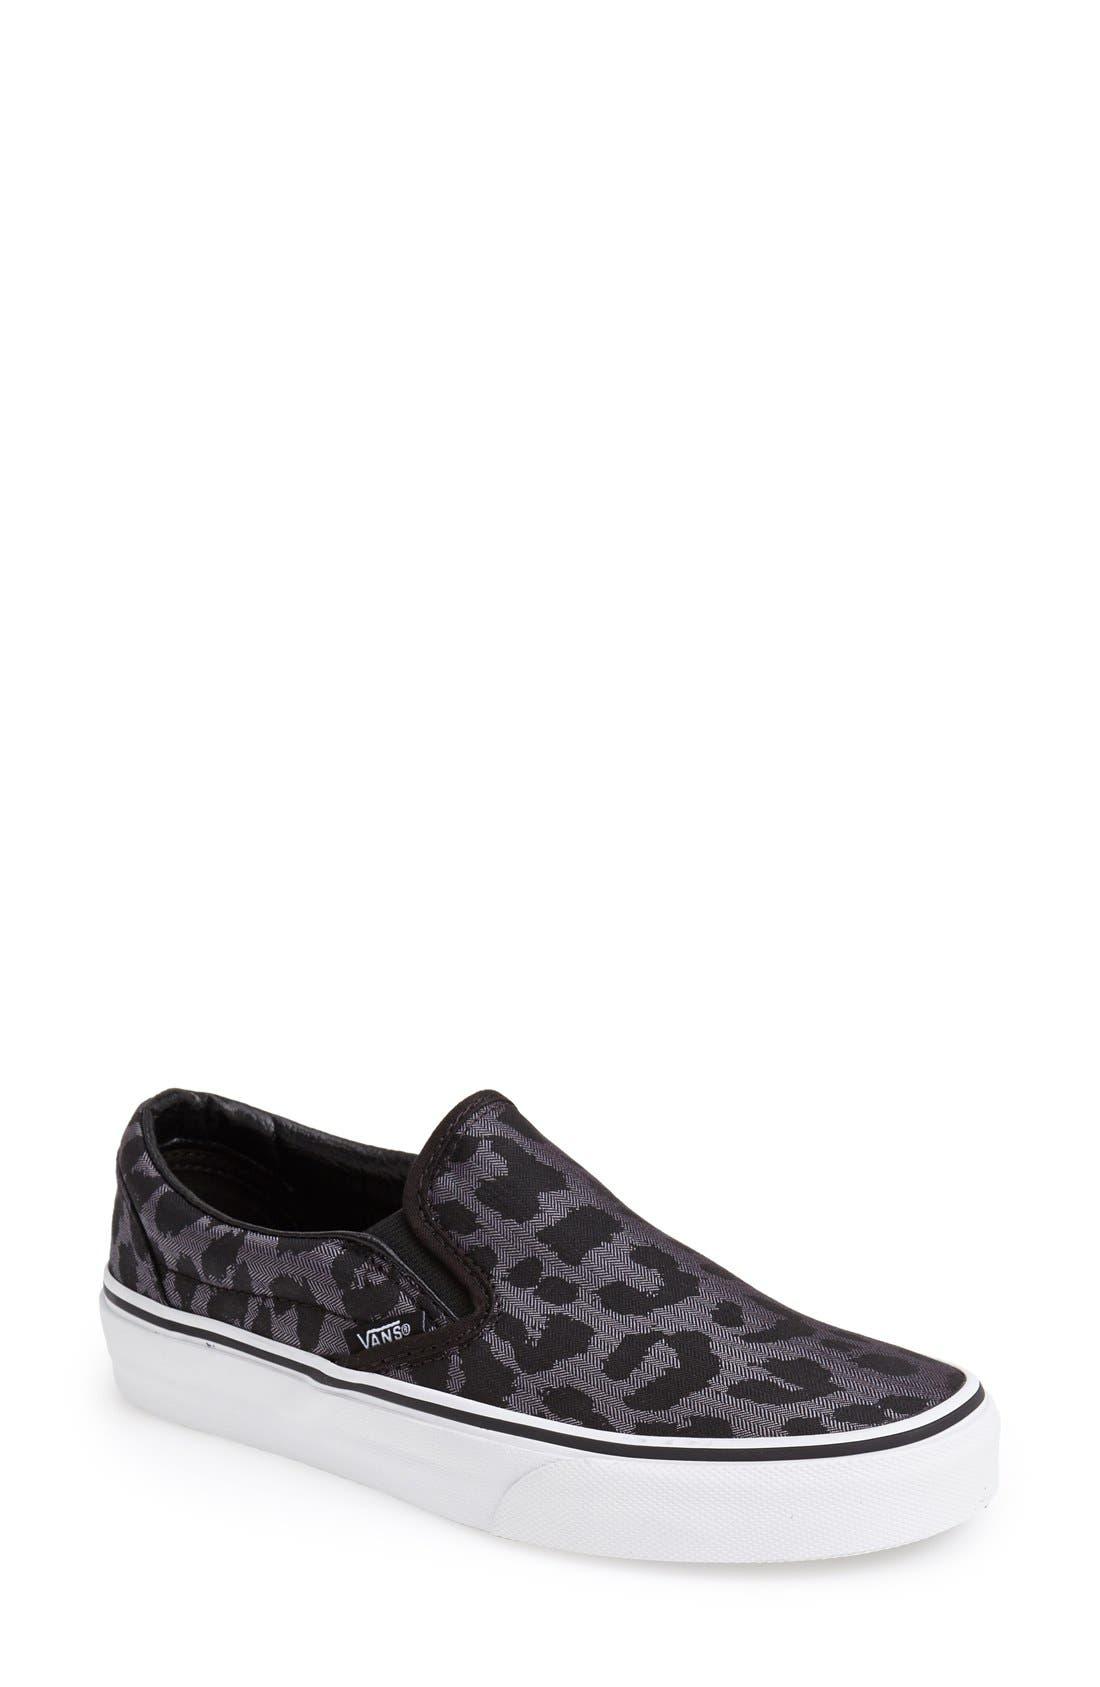 Main Image - Vans Leopard Spot Slip-On Sneaker (Women)